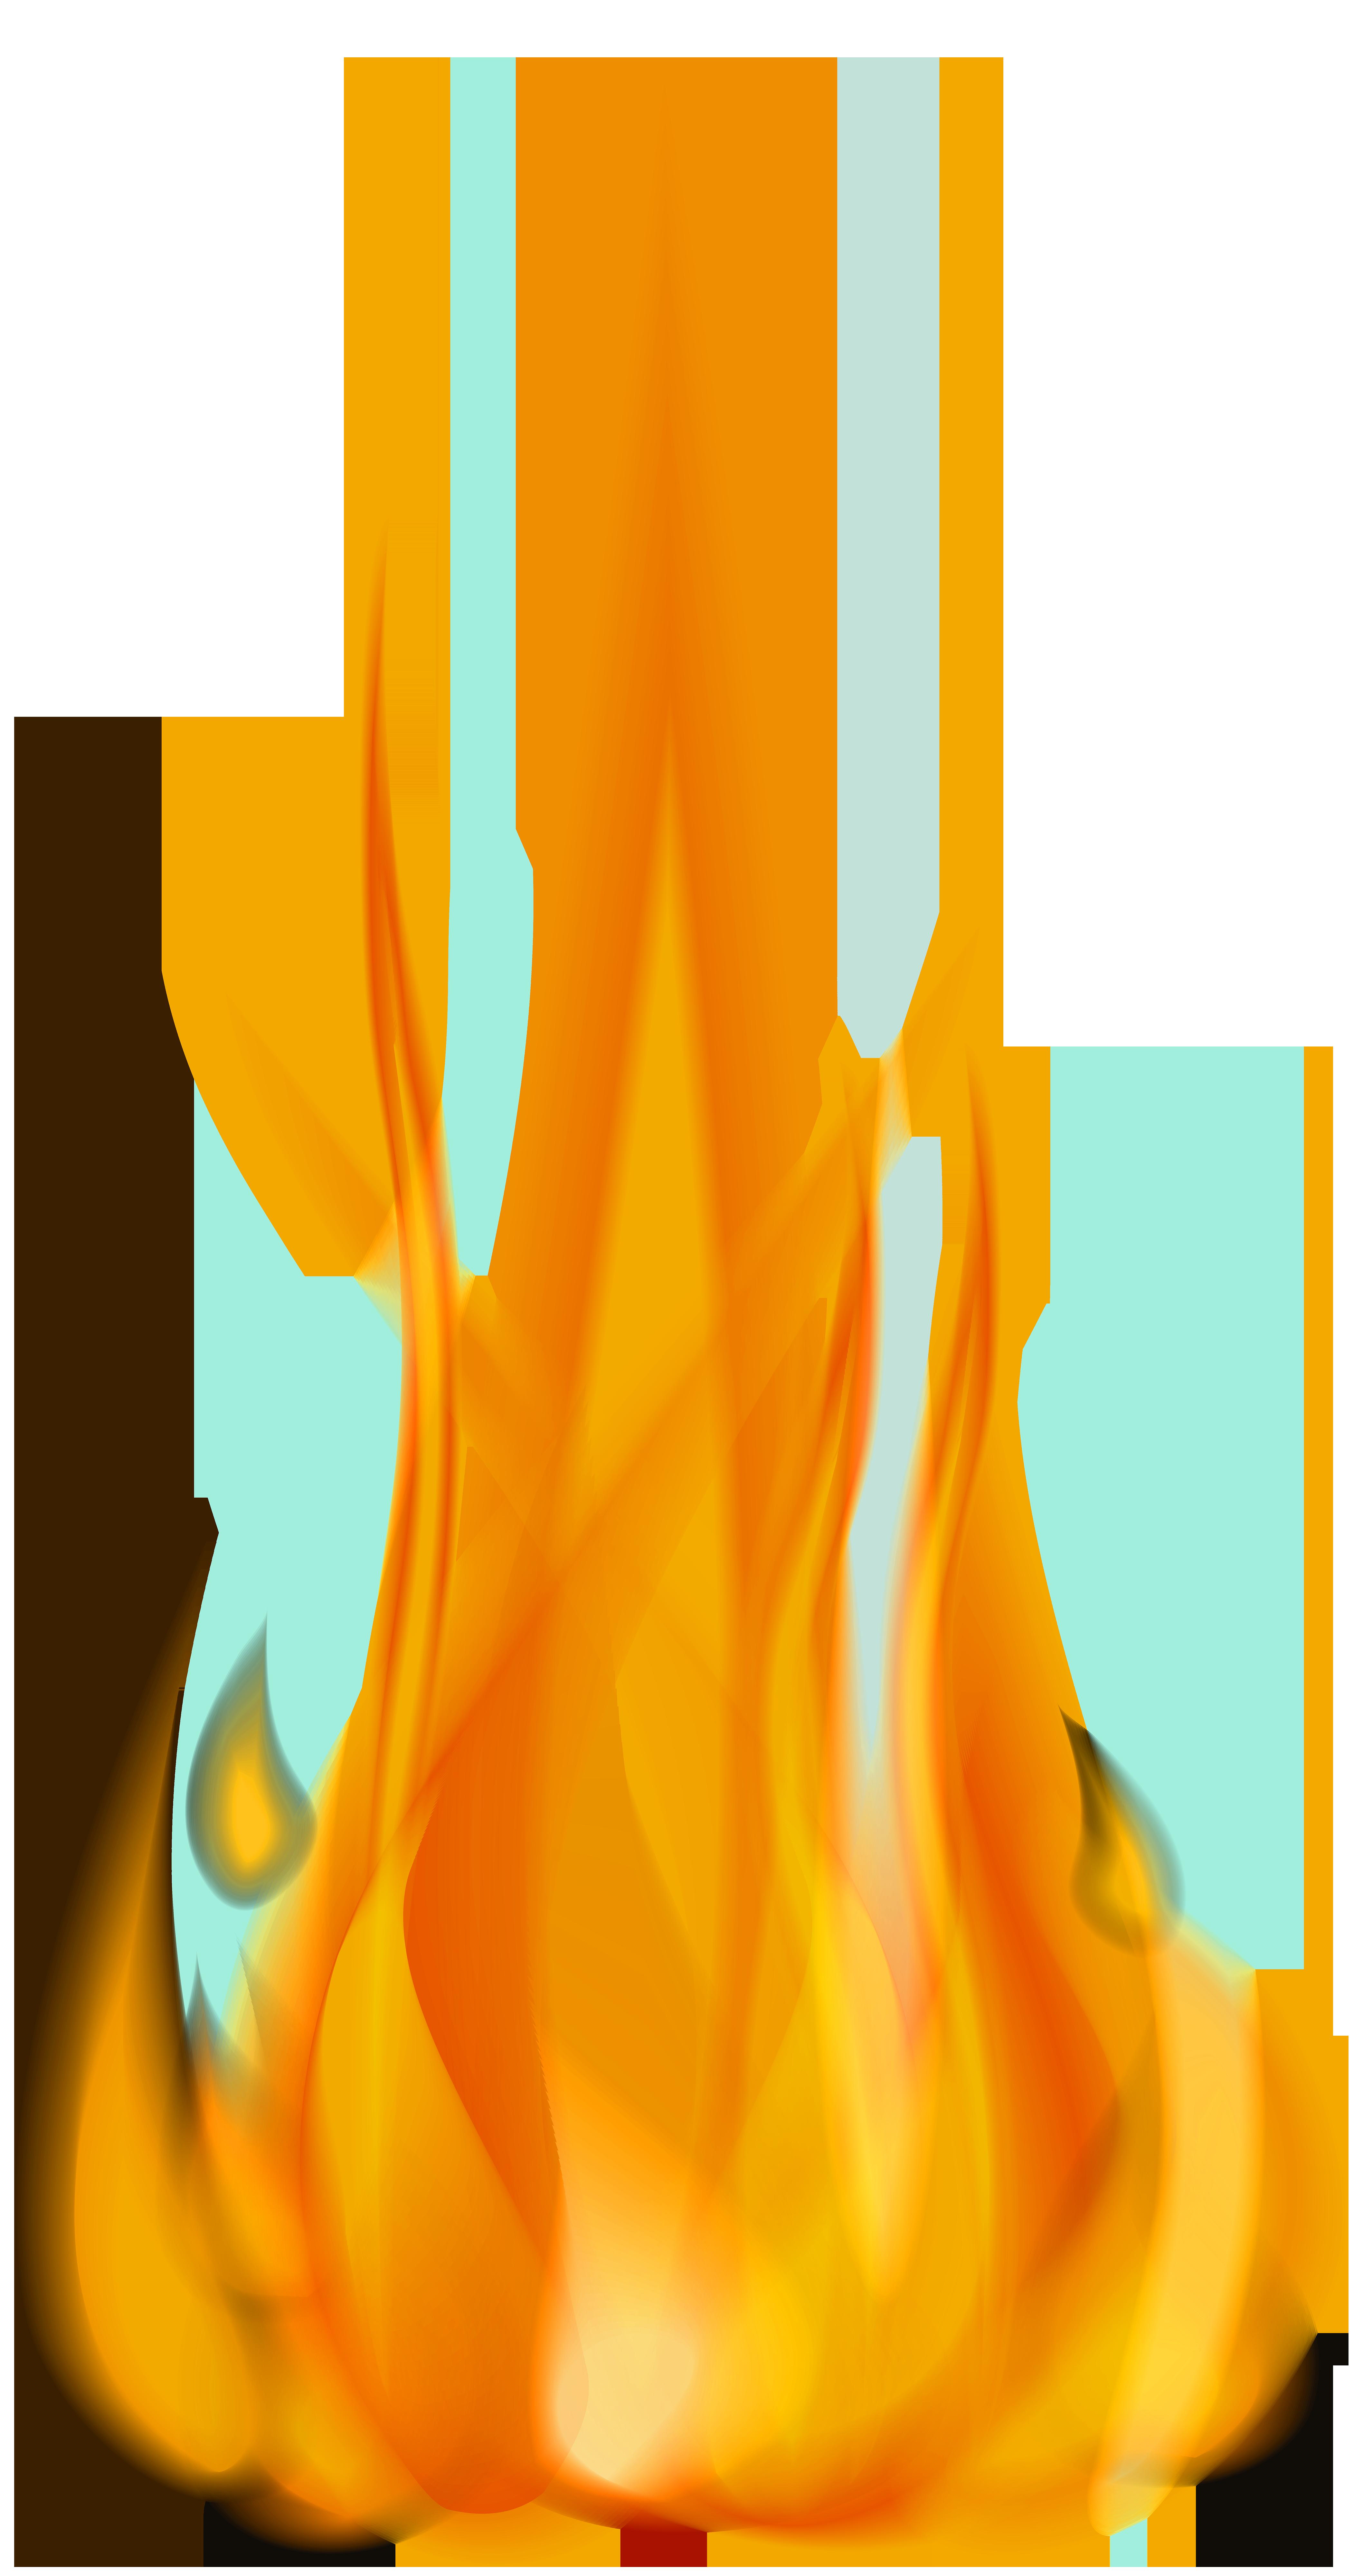 4233x8000 Fire Flame Png Clip Art Imageu200b Gallery Yopriceville